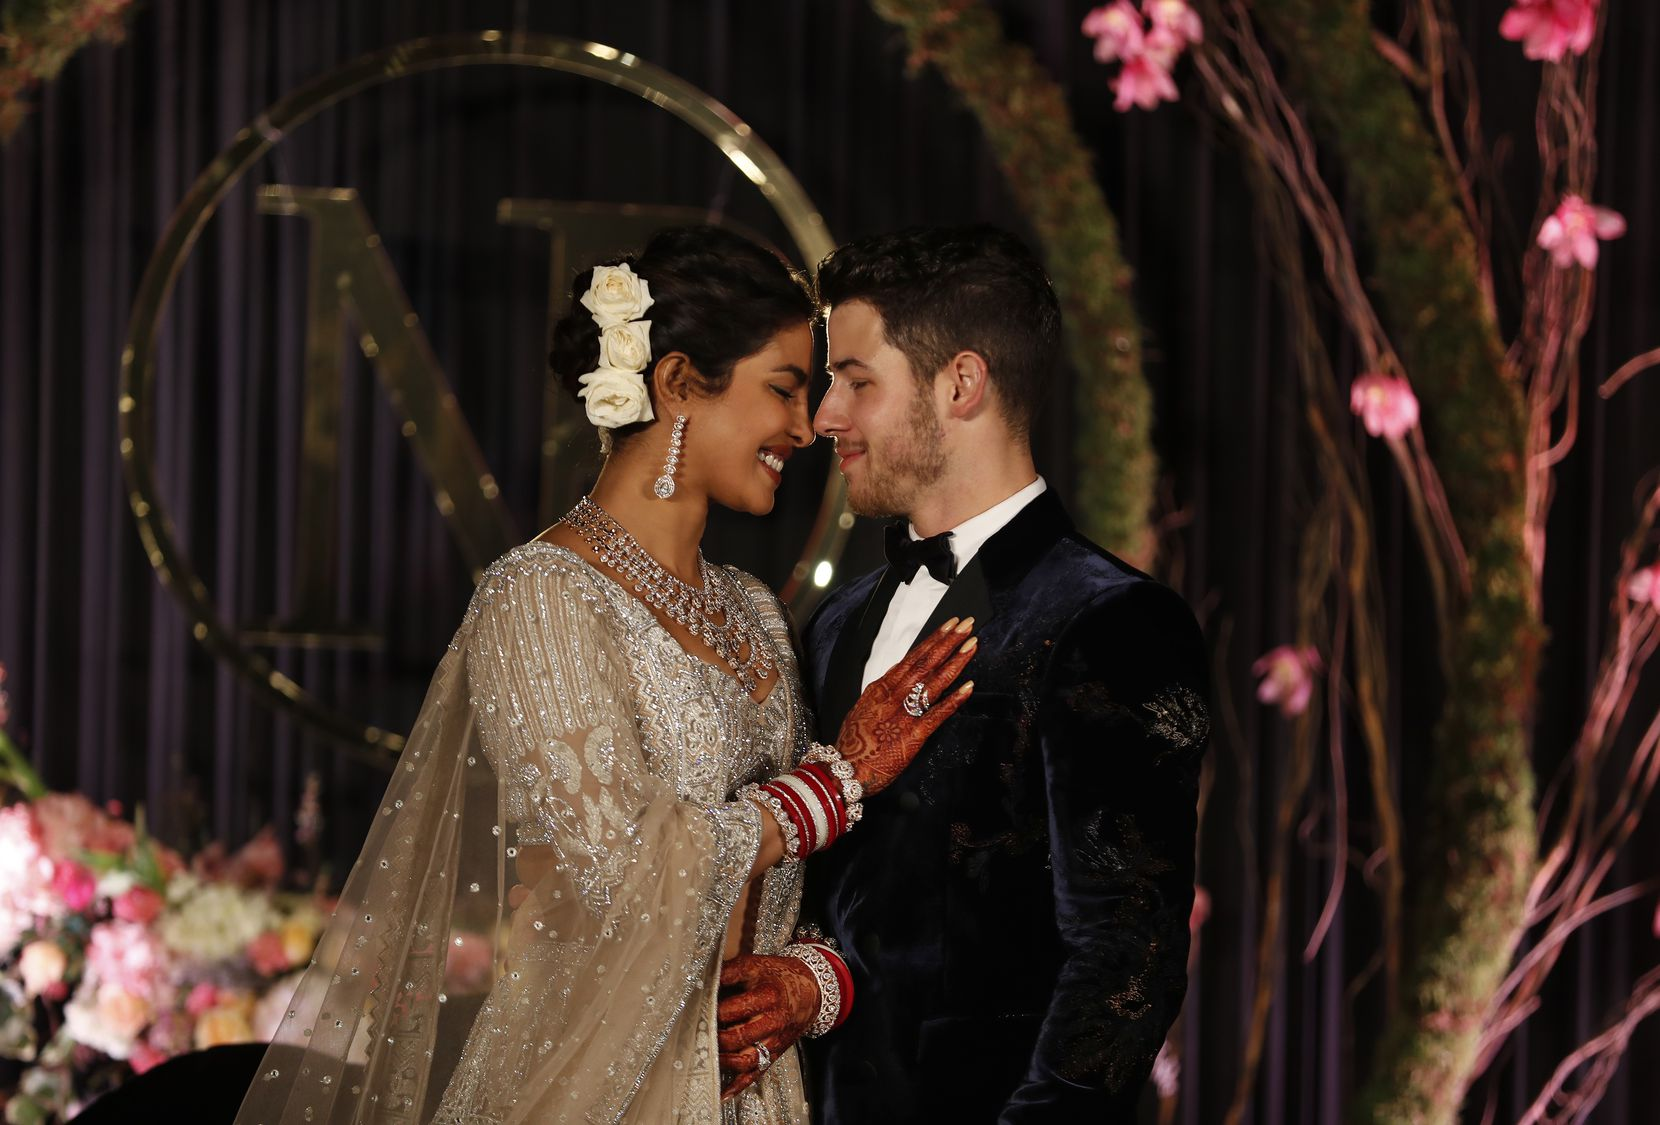 Bollywood actress Priyanka Chopra and musician Nick Jonas stand for photographs at their wedding reception in New Delhi, India, Tuesday, Dec. 4, 2018.